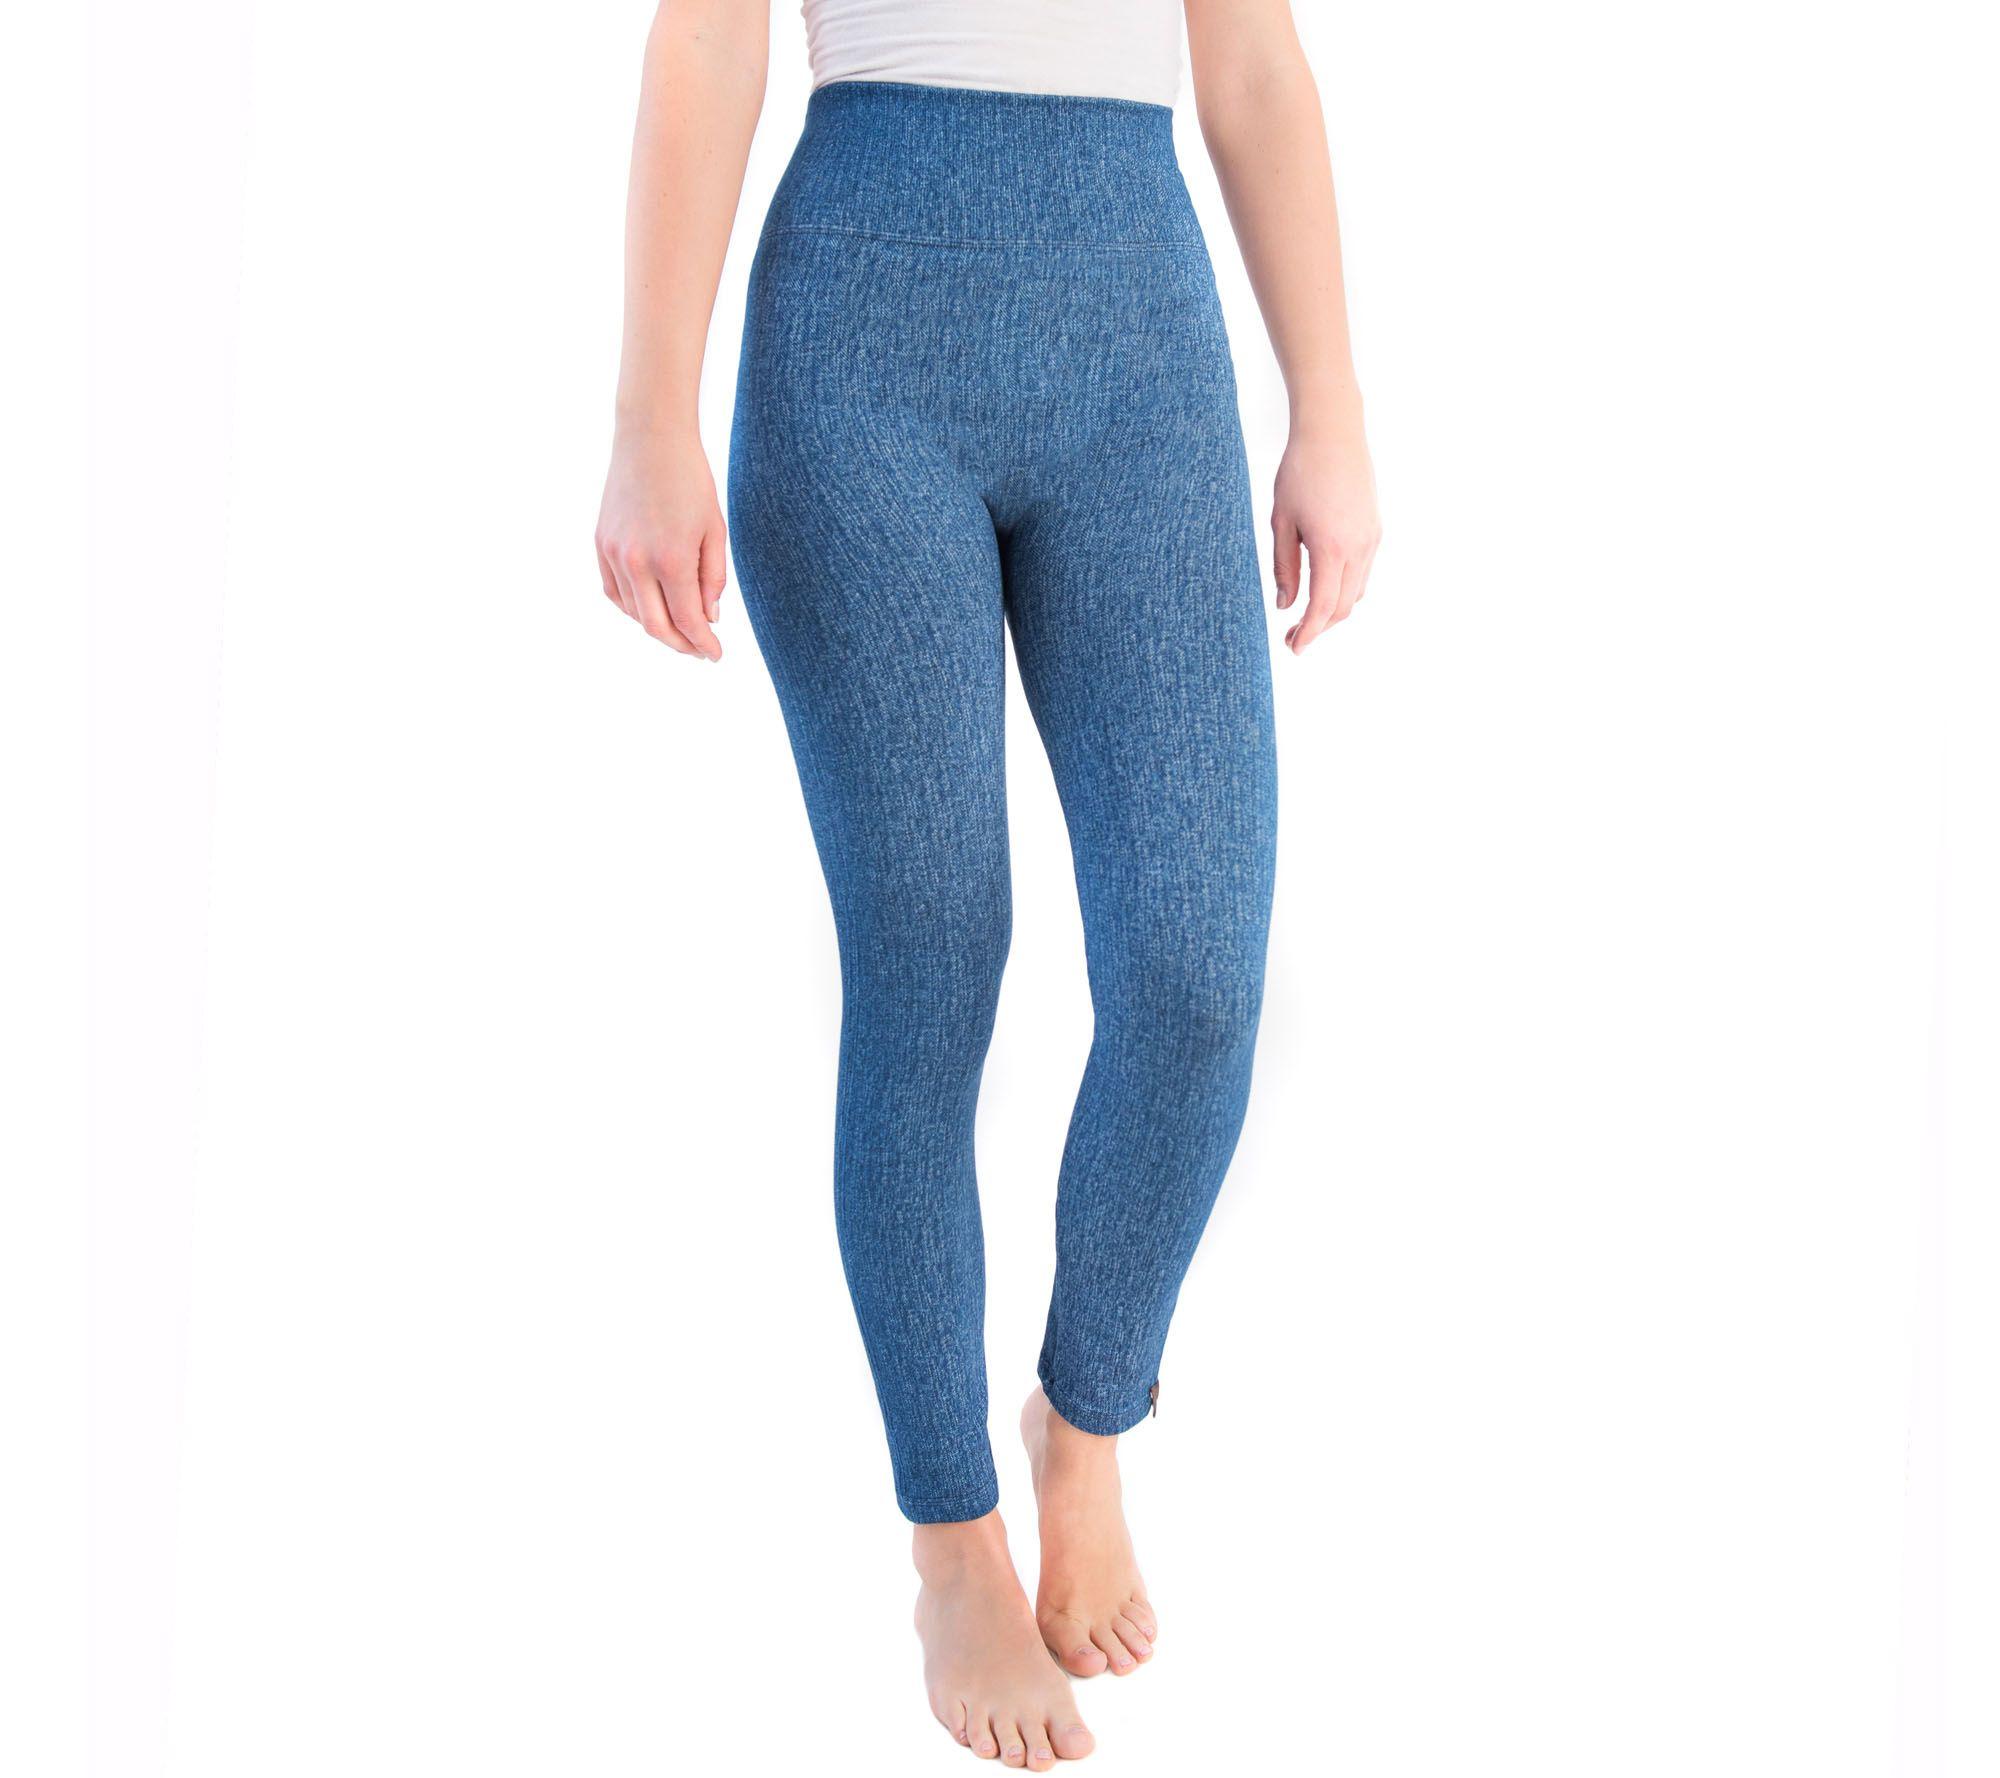 d7a5d4b76a3fcd MUK LUKS Women's Printed Leggings - Page 1 — QVC.com